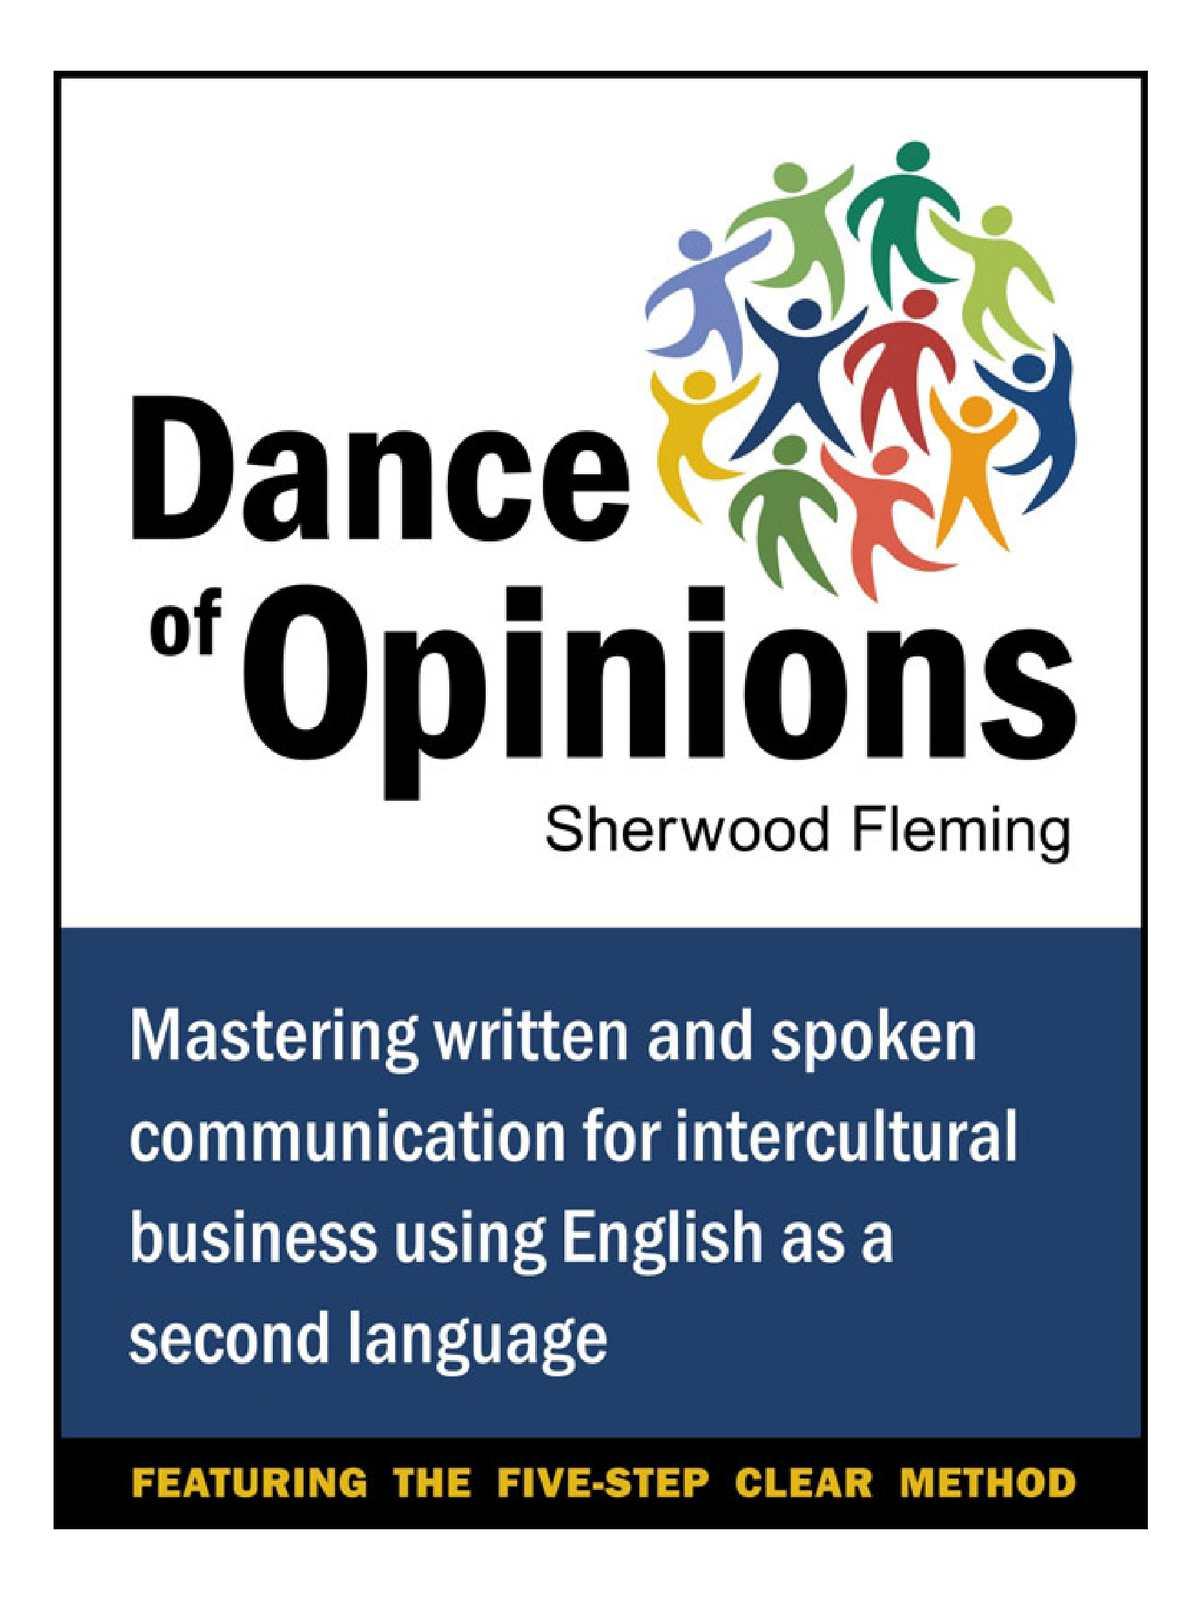 Calaméo - Intercultural Communication: Dance of Opinions